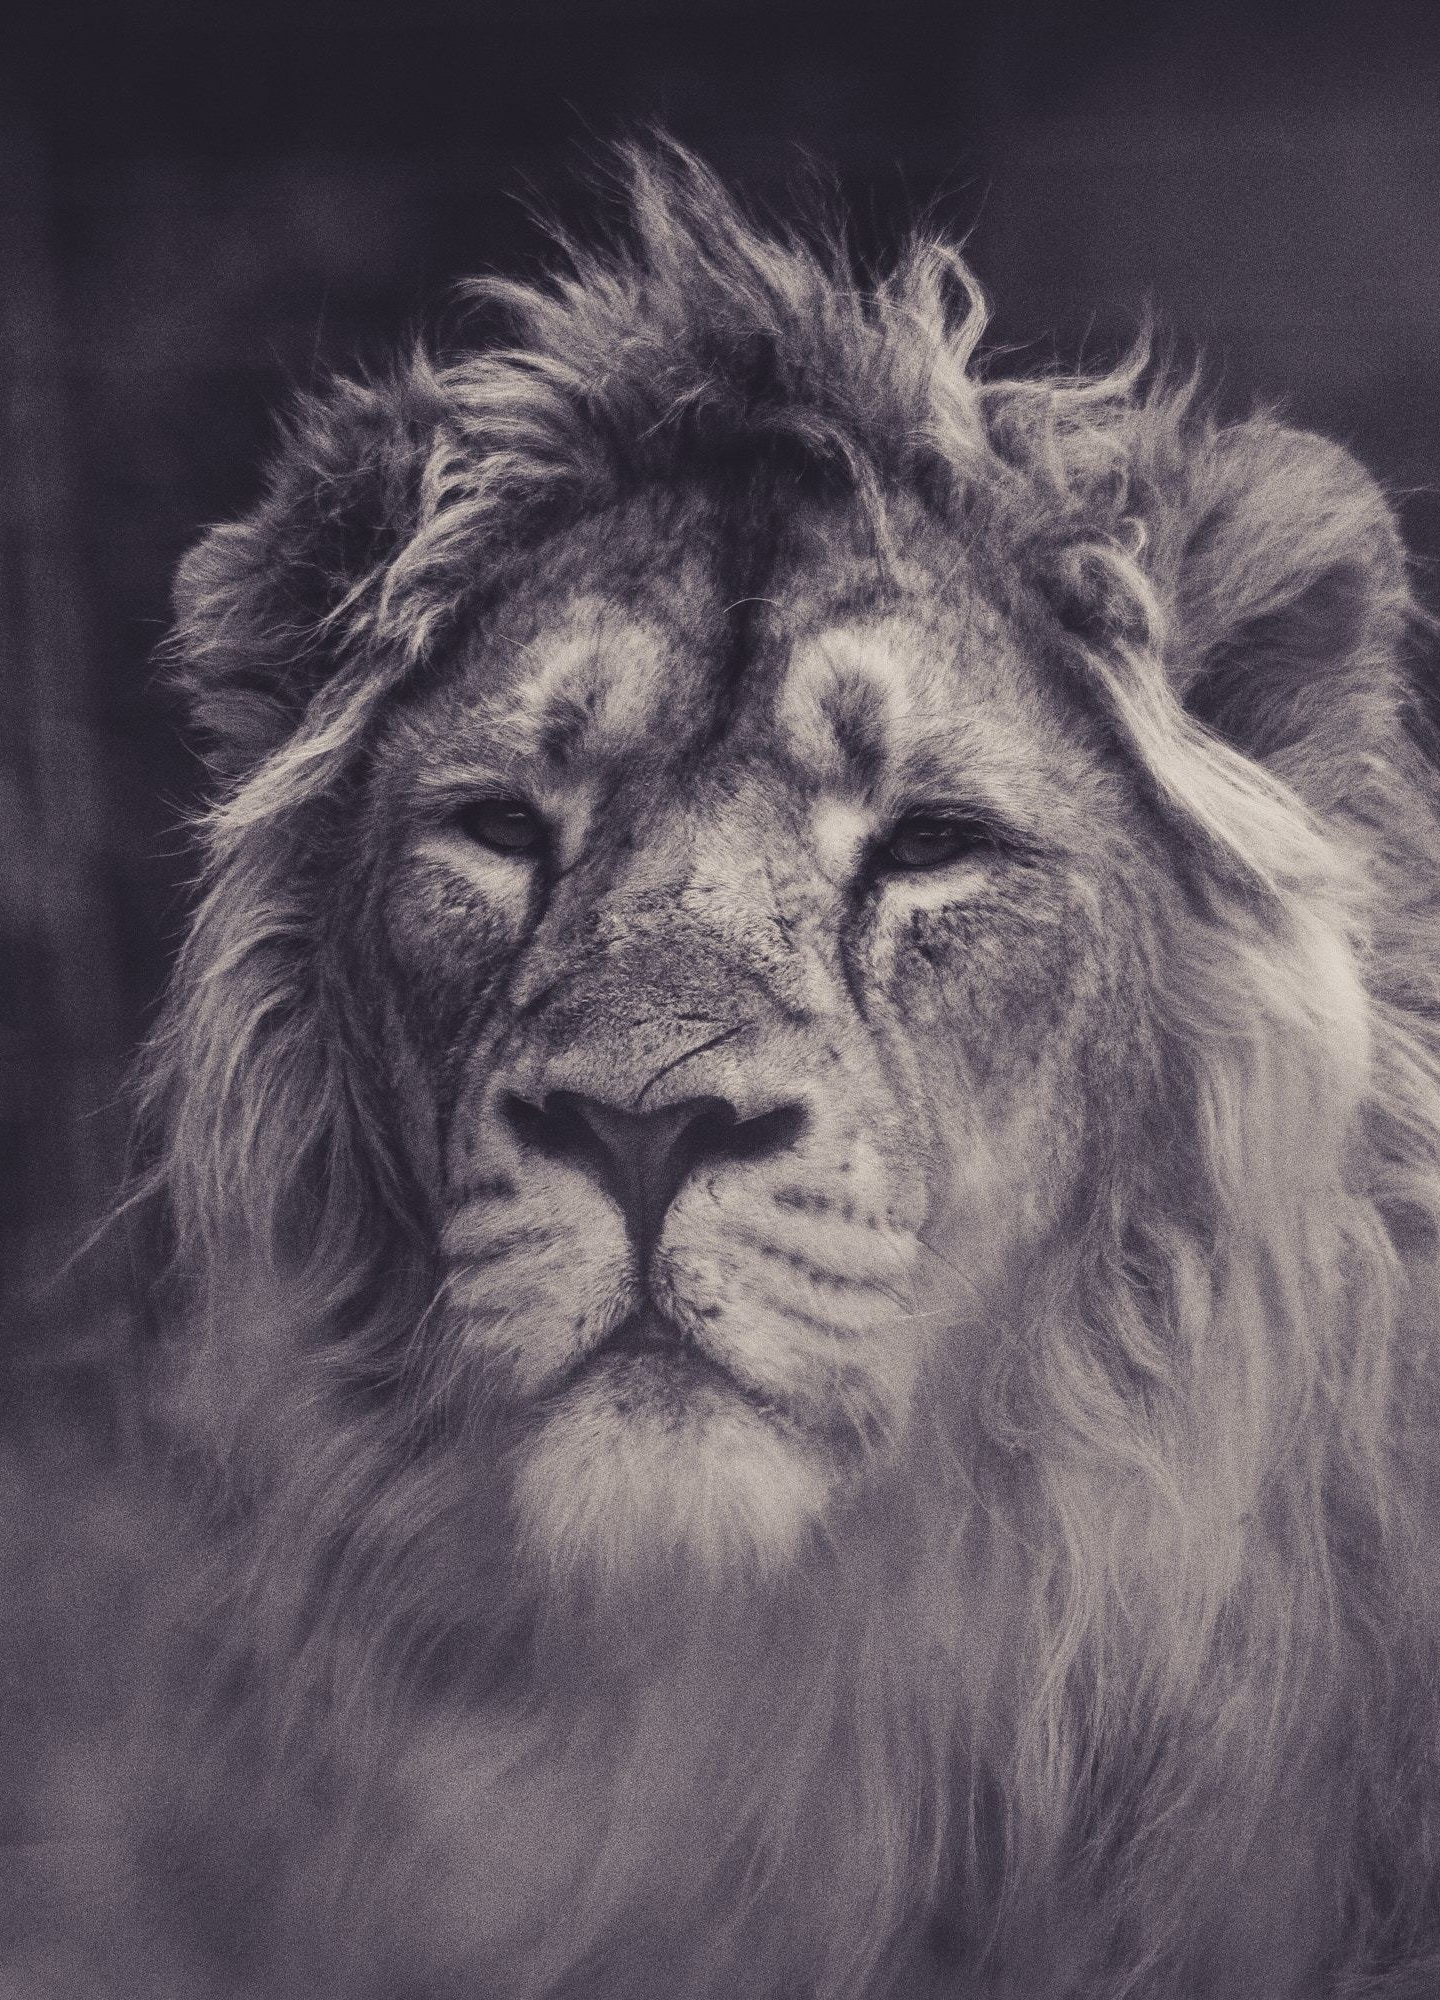 Lion, calm, predator, muzzle, 1440x2880 wallpaper